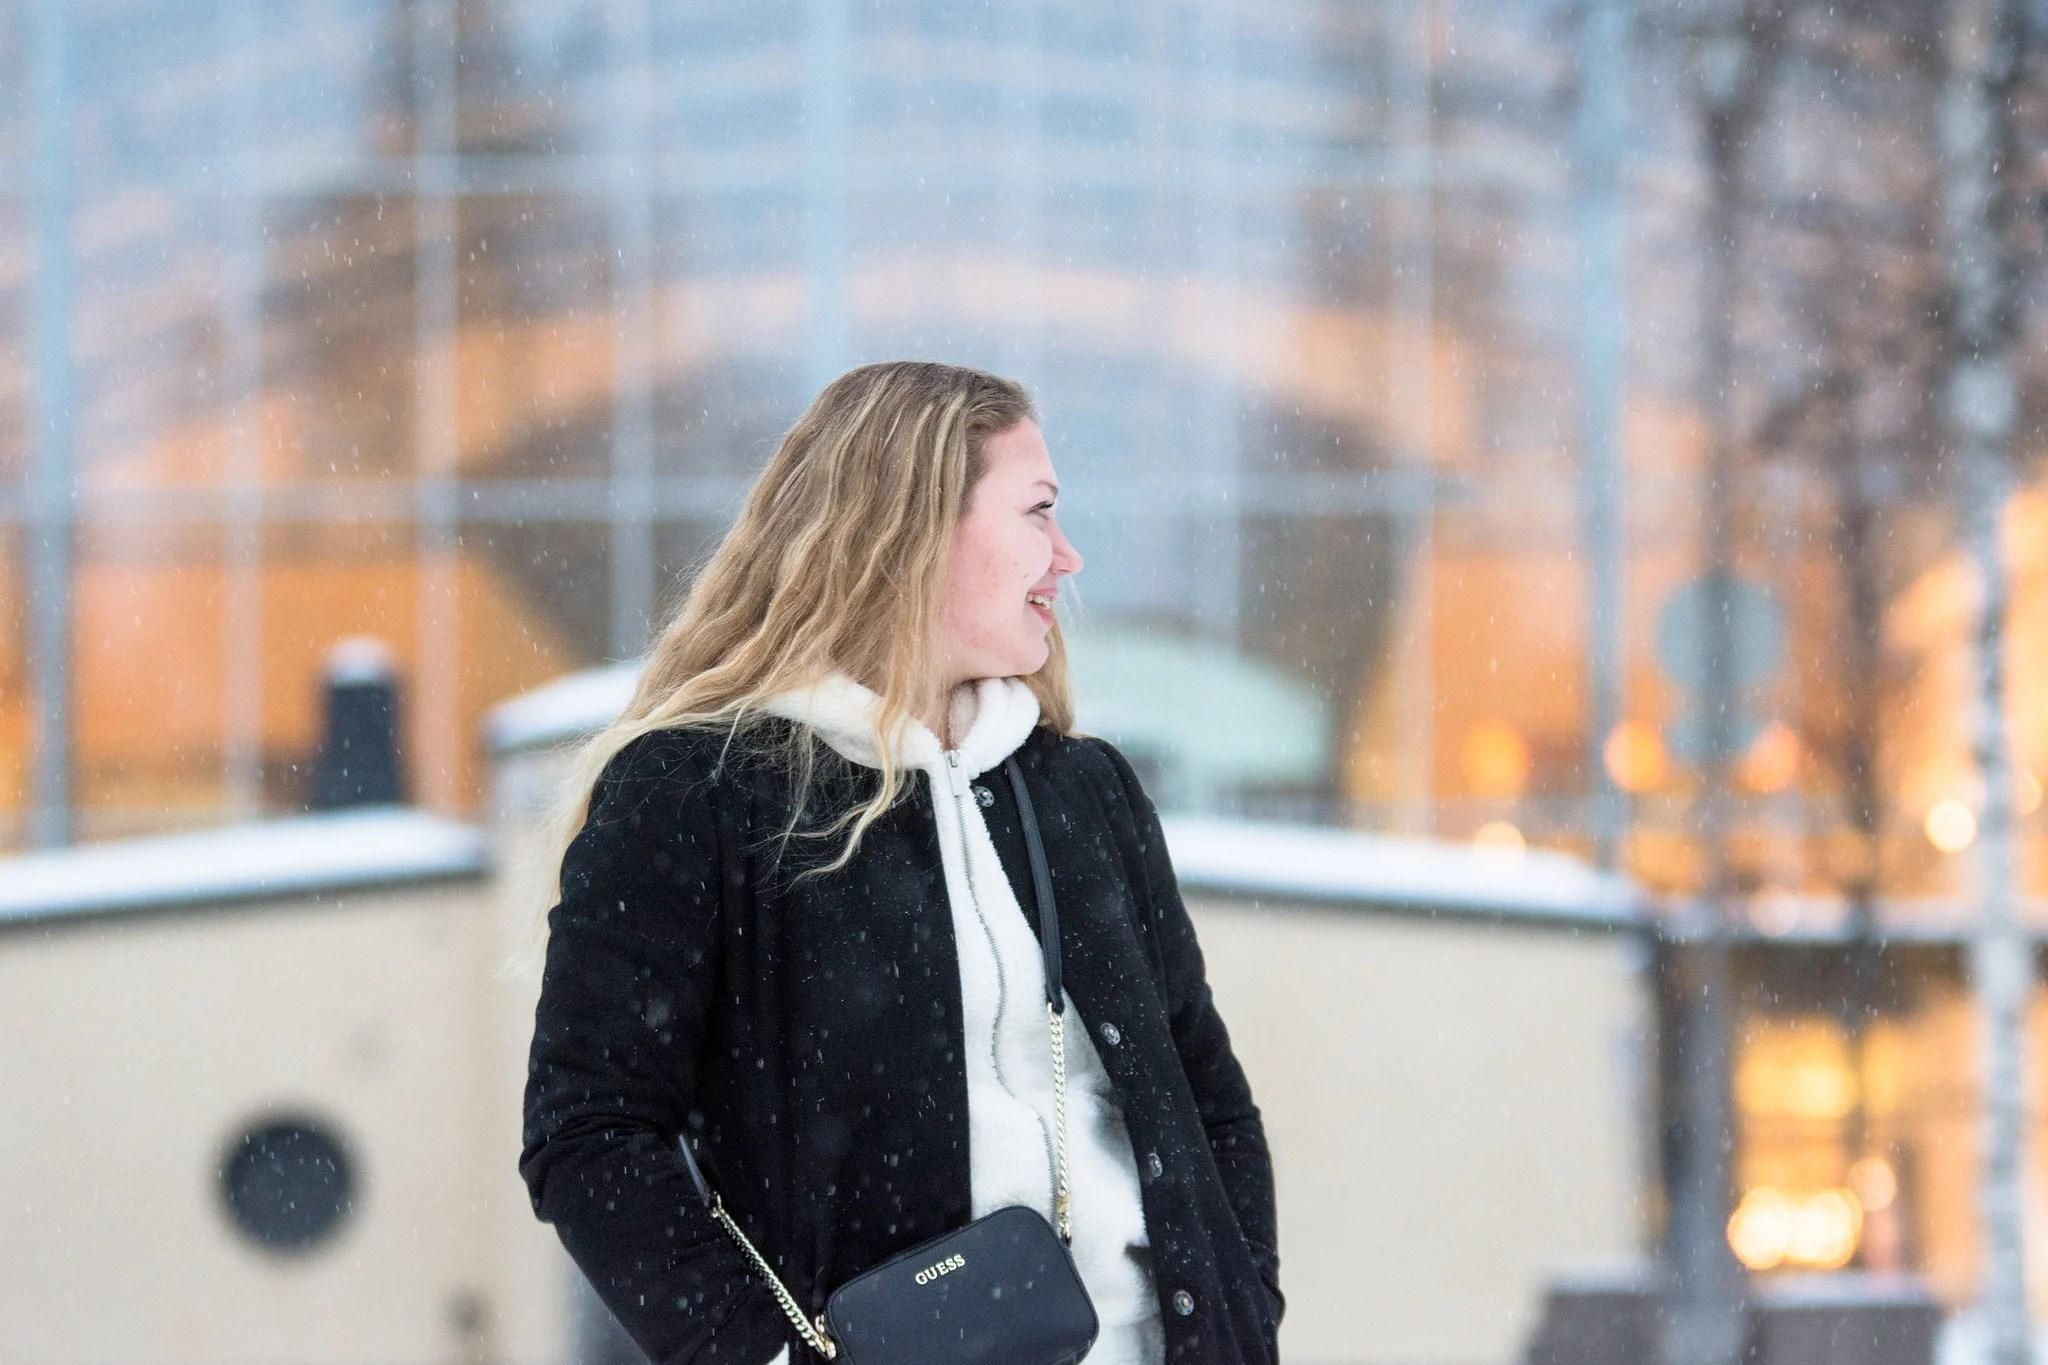 Snowy photoshoot